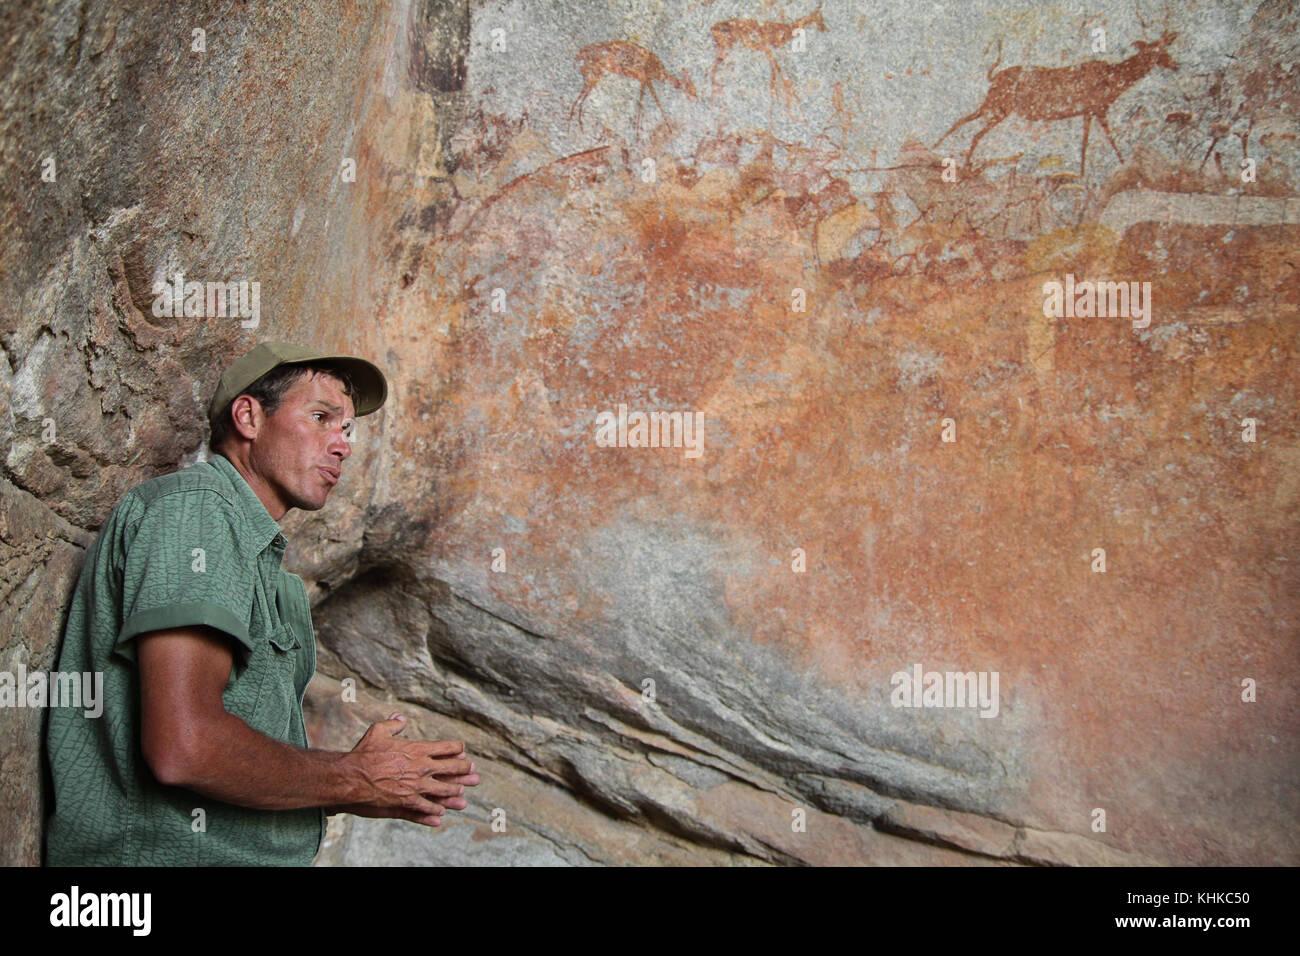 MATOPO, Zimbabwe, 17 de octubre. Guardabosque Ian Harmer conversaciones para turistas sobre pintura rupestre de Imagen De Stock